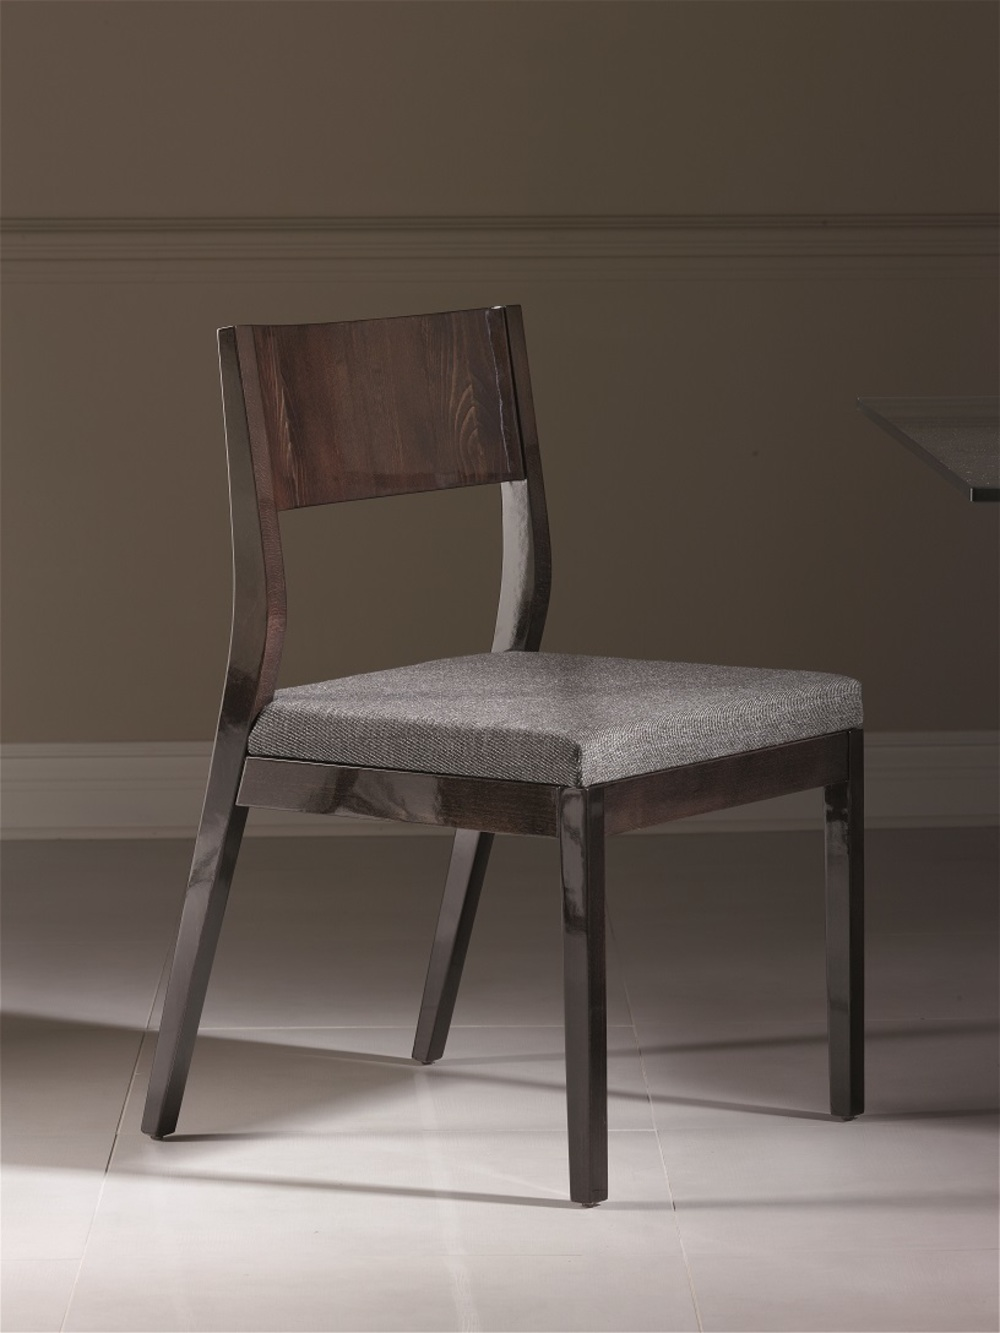 Hurtado - Seating Side Chair